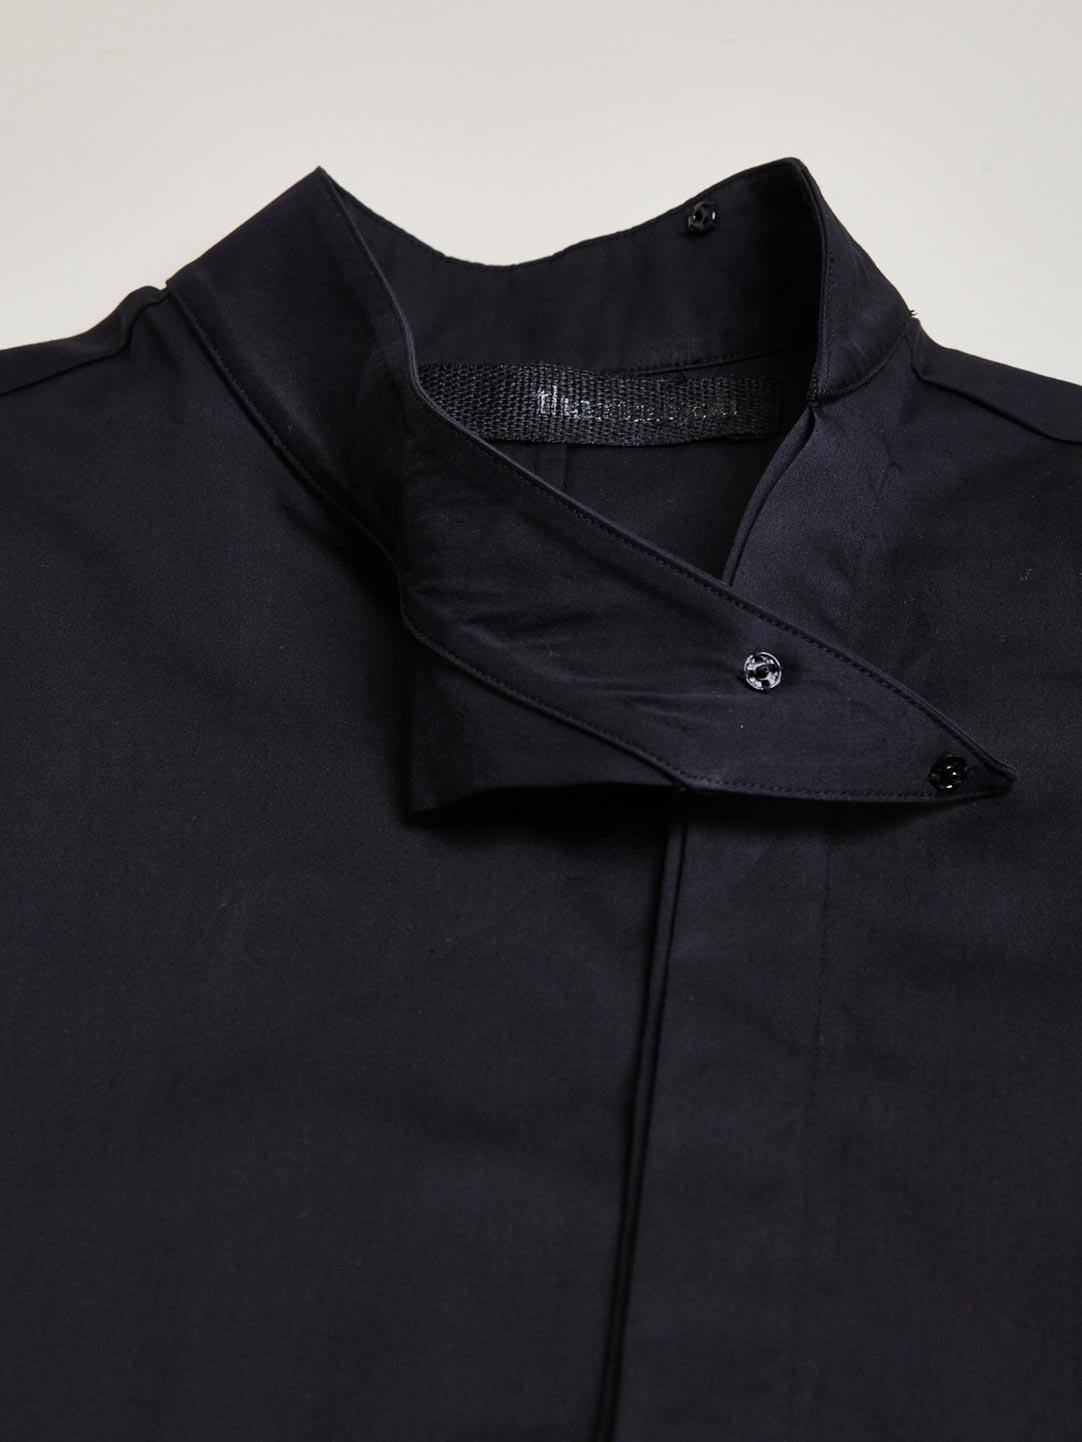 Kimono Dervish Collar Shirt Thamanyah 3